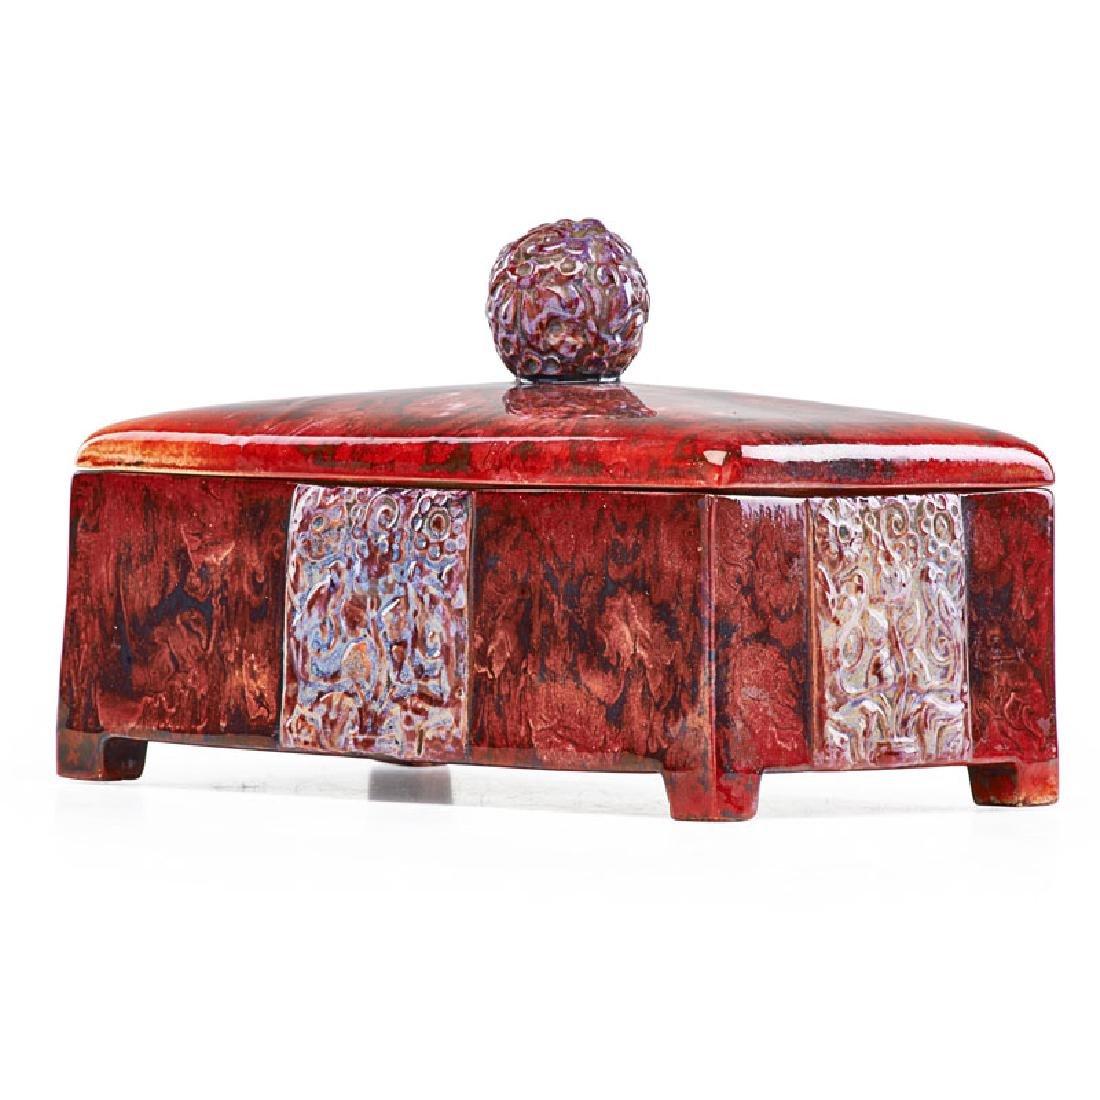 ZSOLNAY Rare decorative box